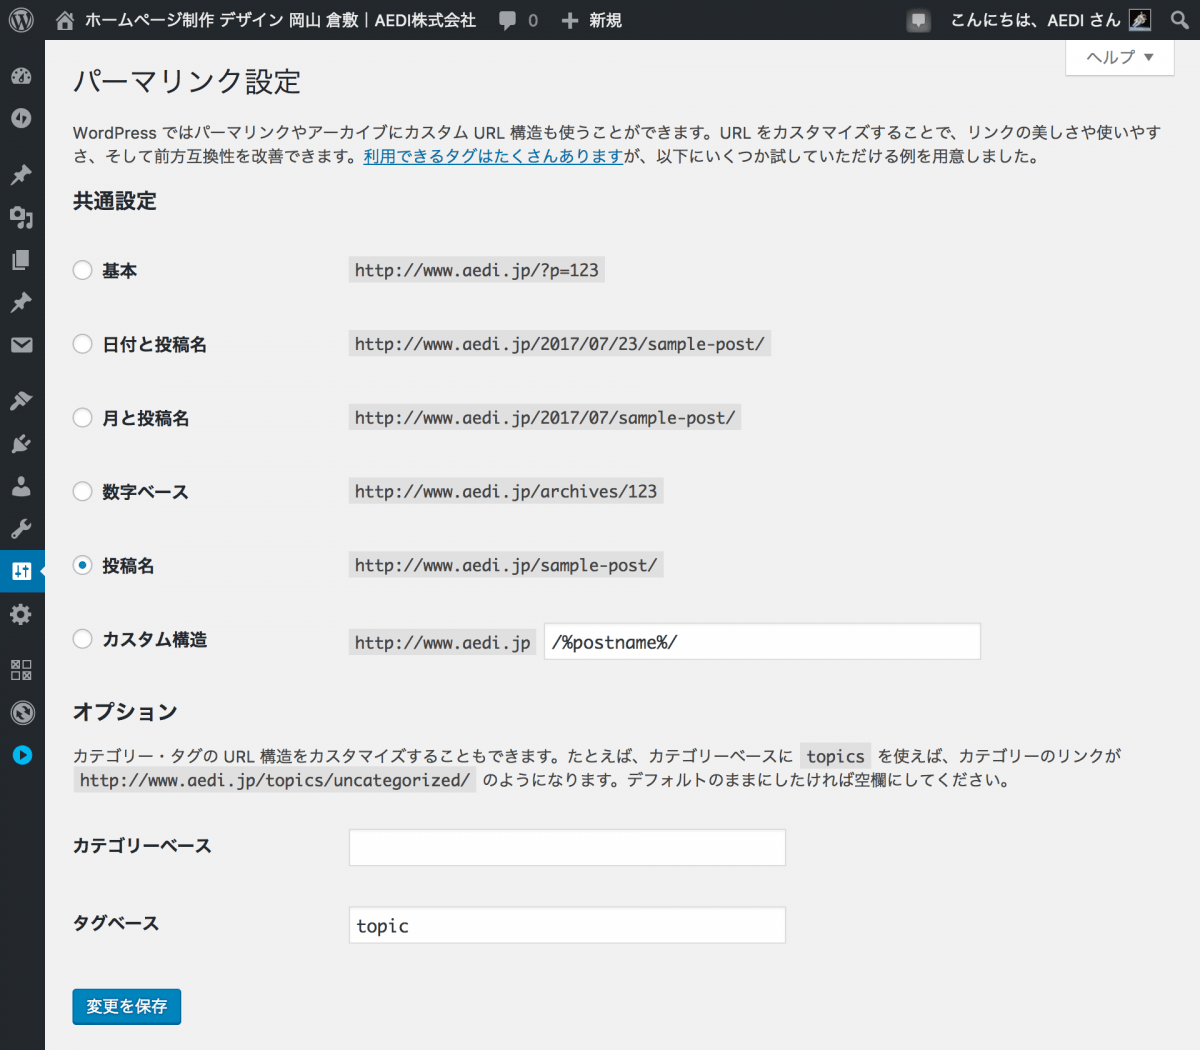 WordPressのタグをトピックに変更する